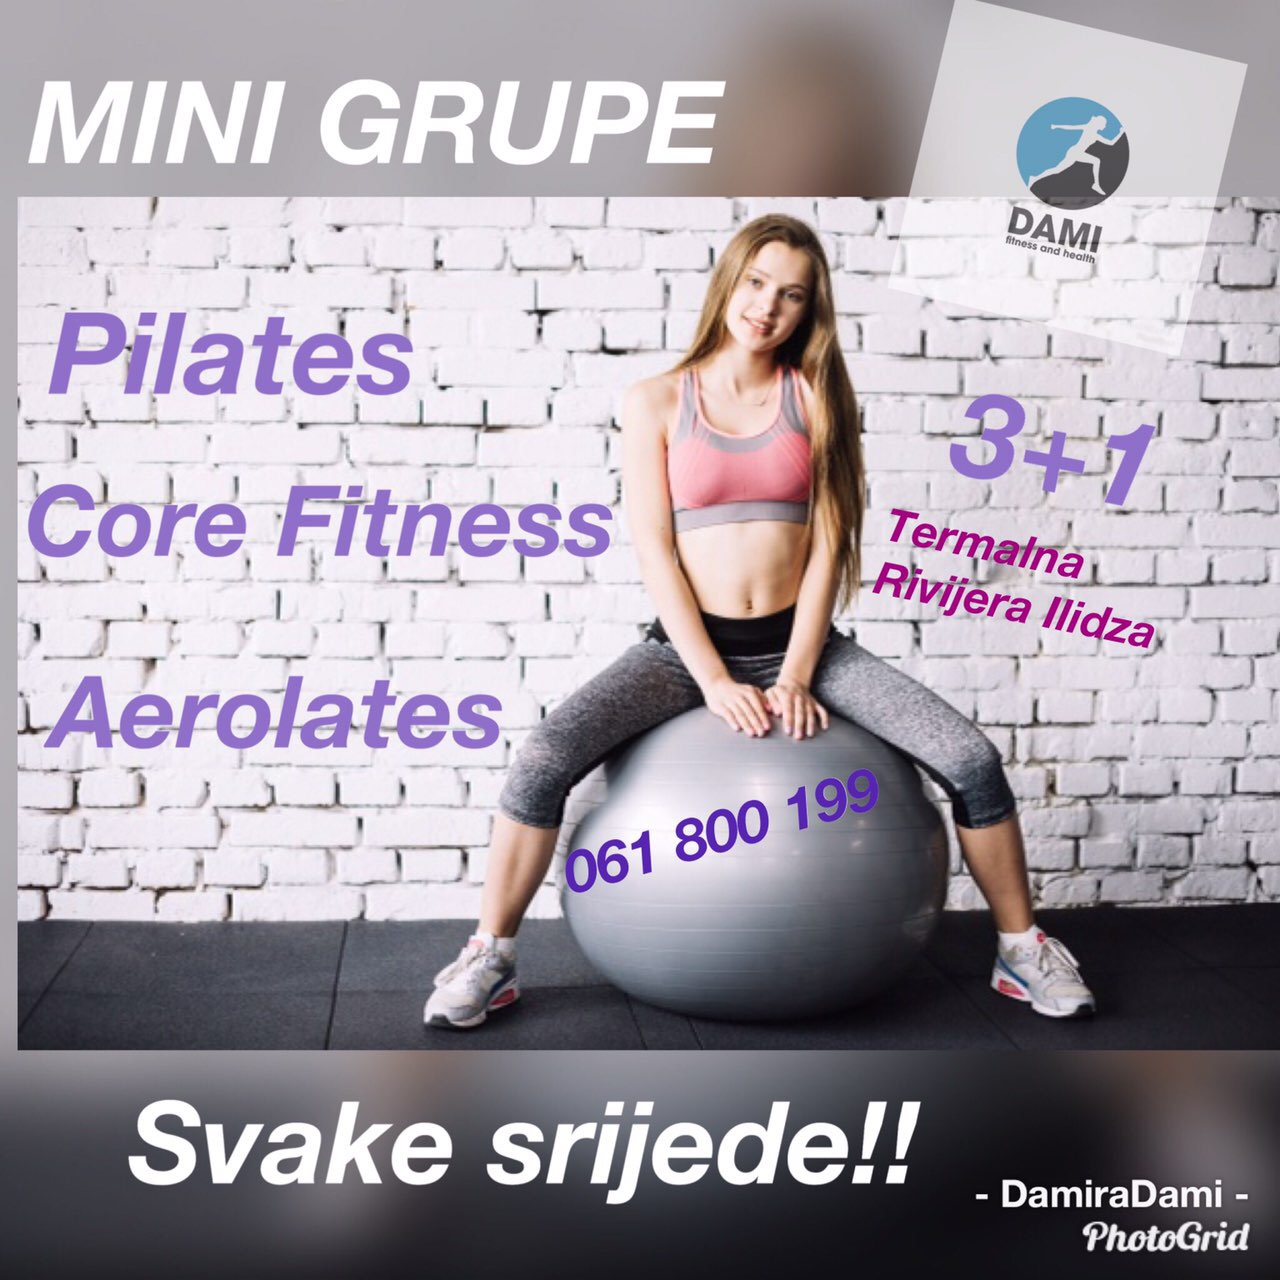 Pilates, Core Fitness, Aerolates